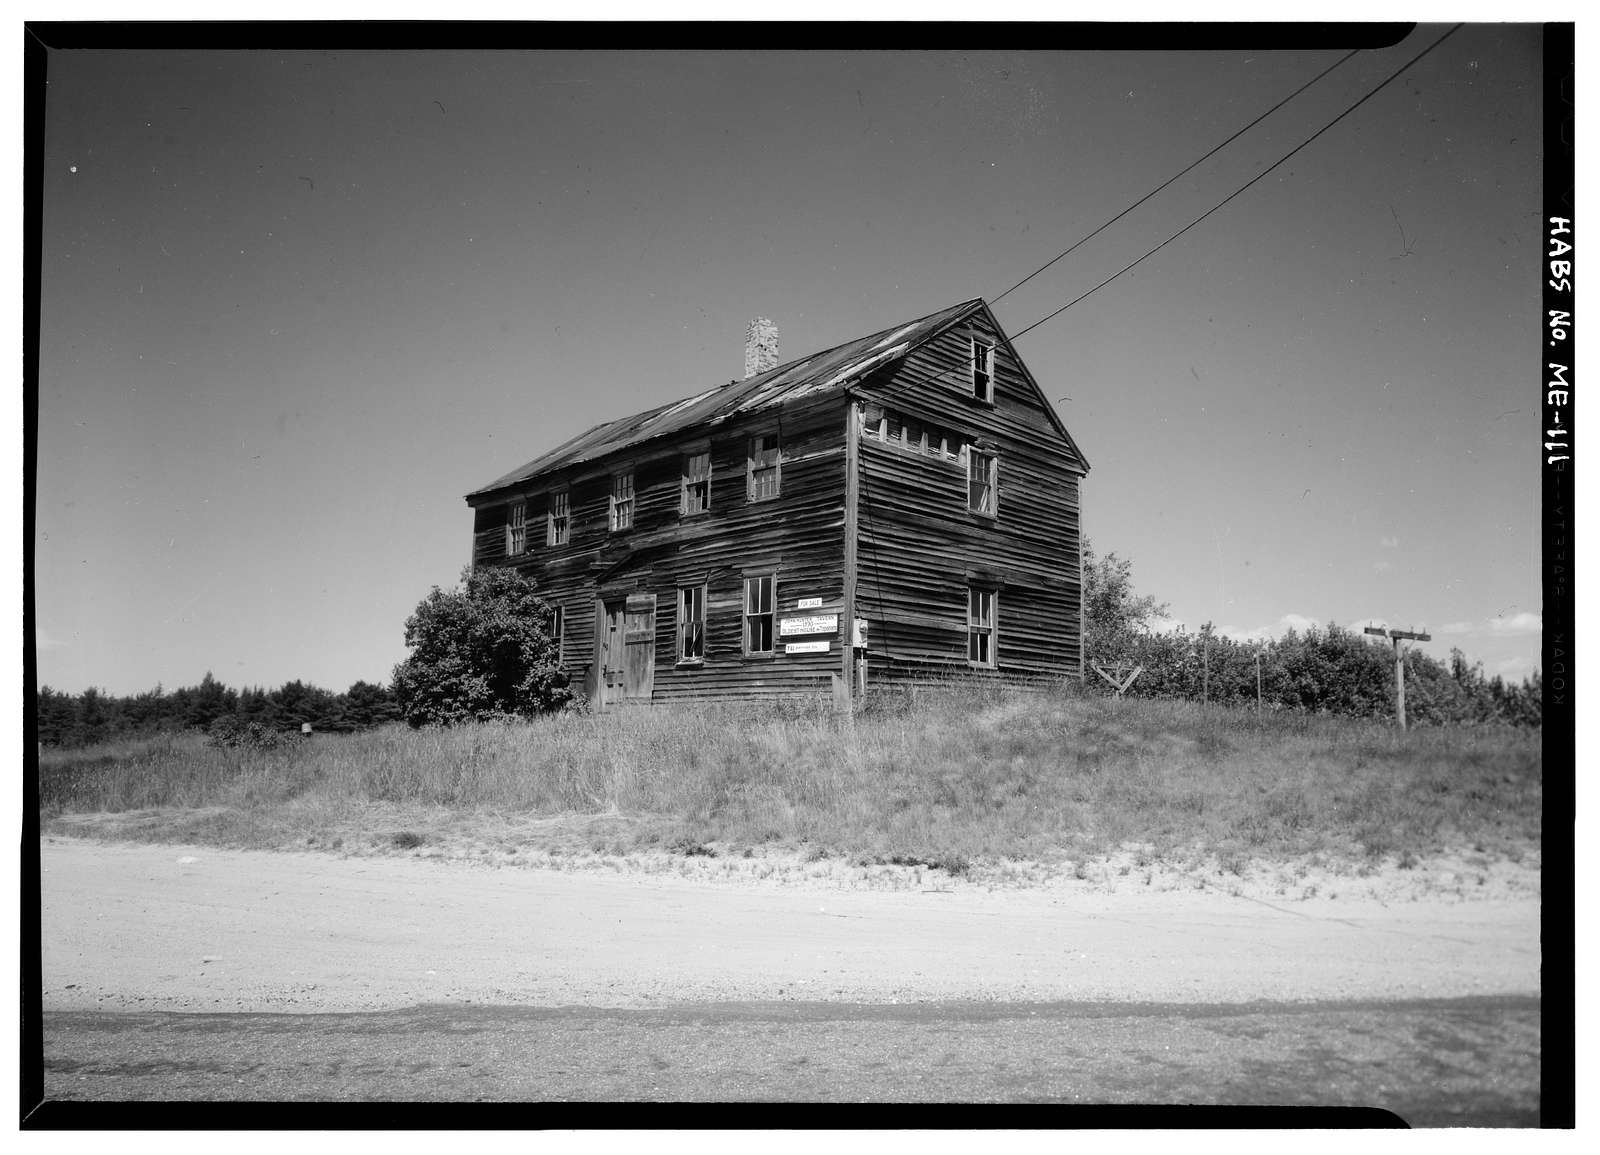 John Hunter Tavern, Topsham-Bowdoinham Road (State Route 24), Topsham, Sagadahoc County, ME